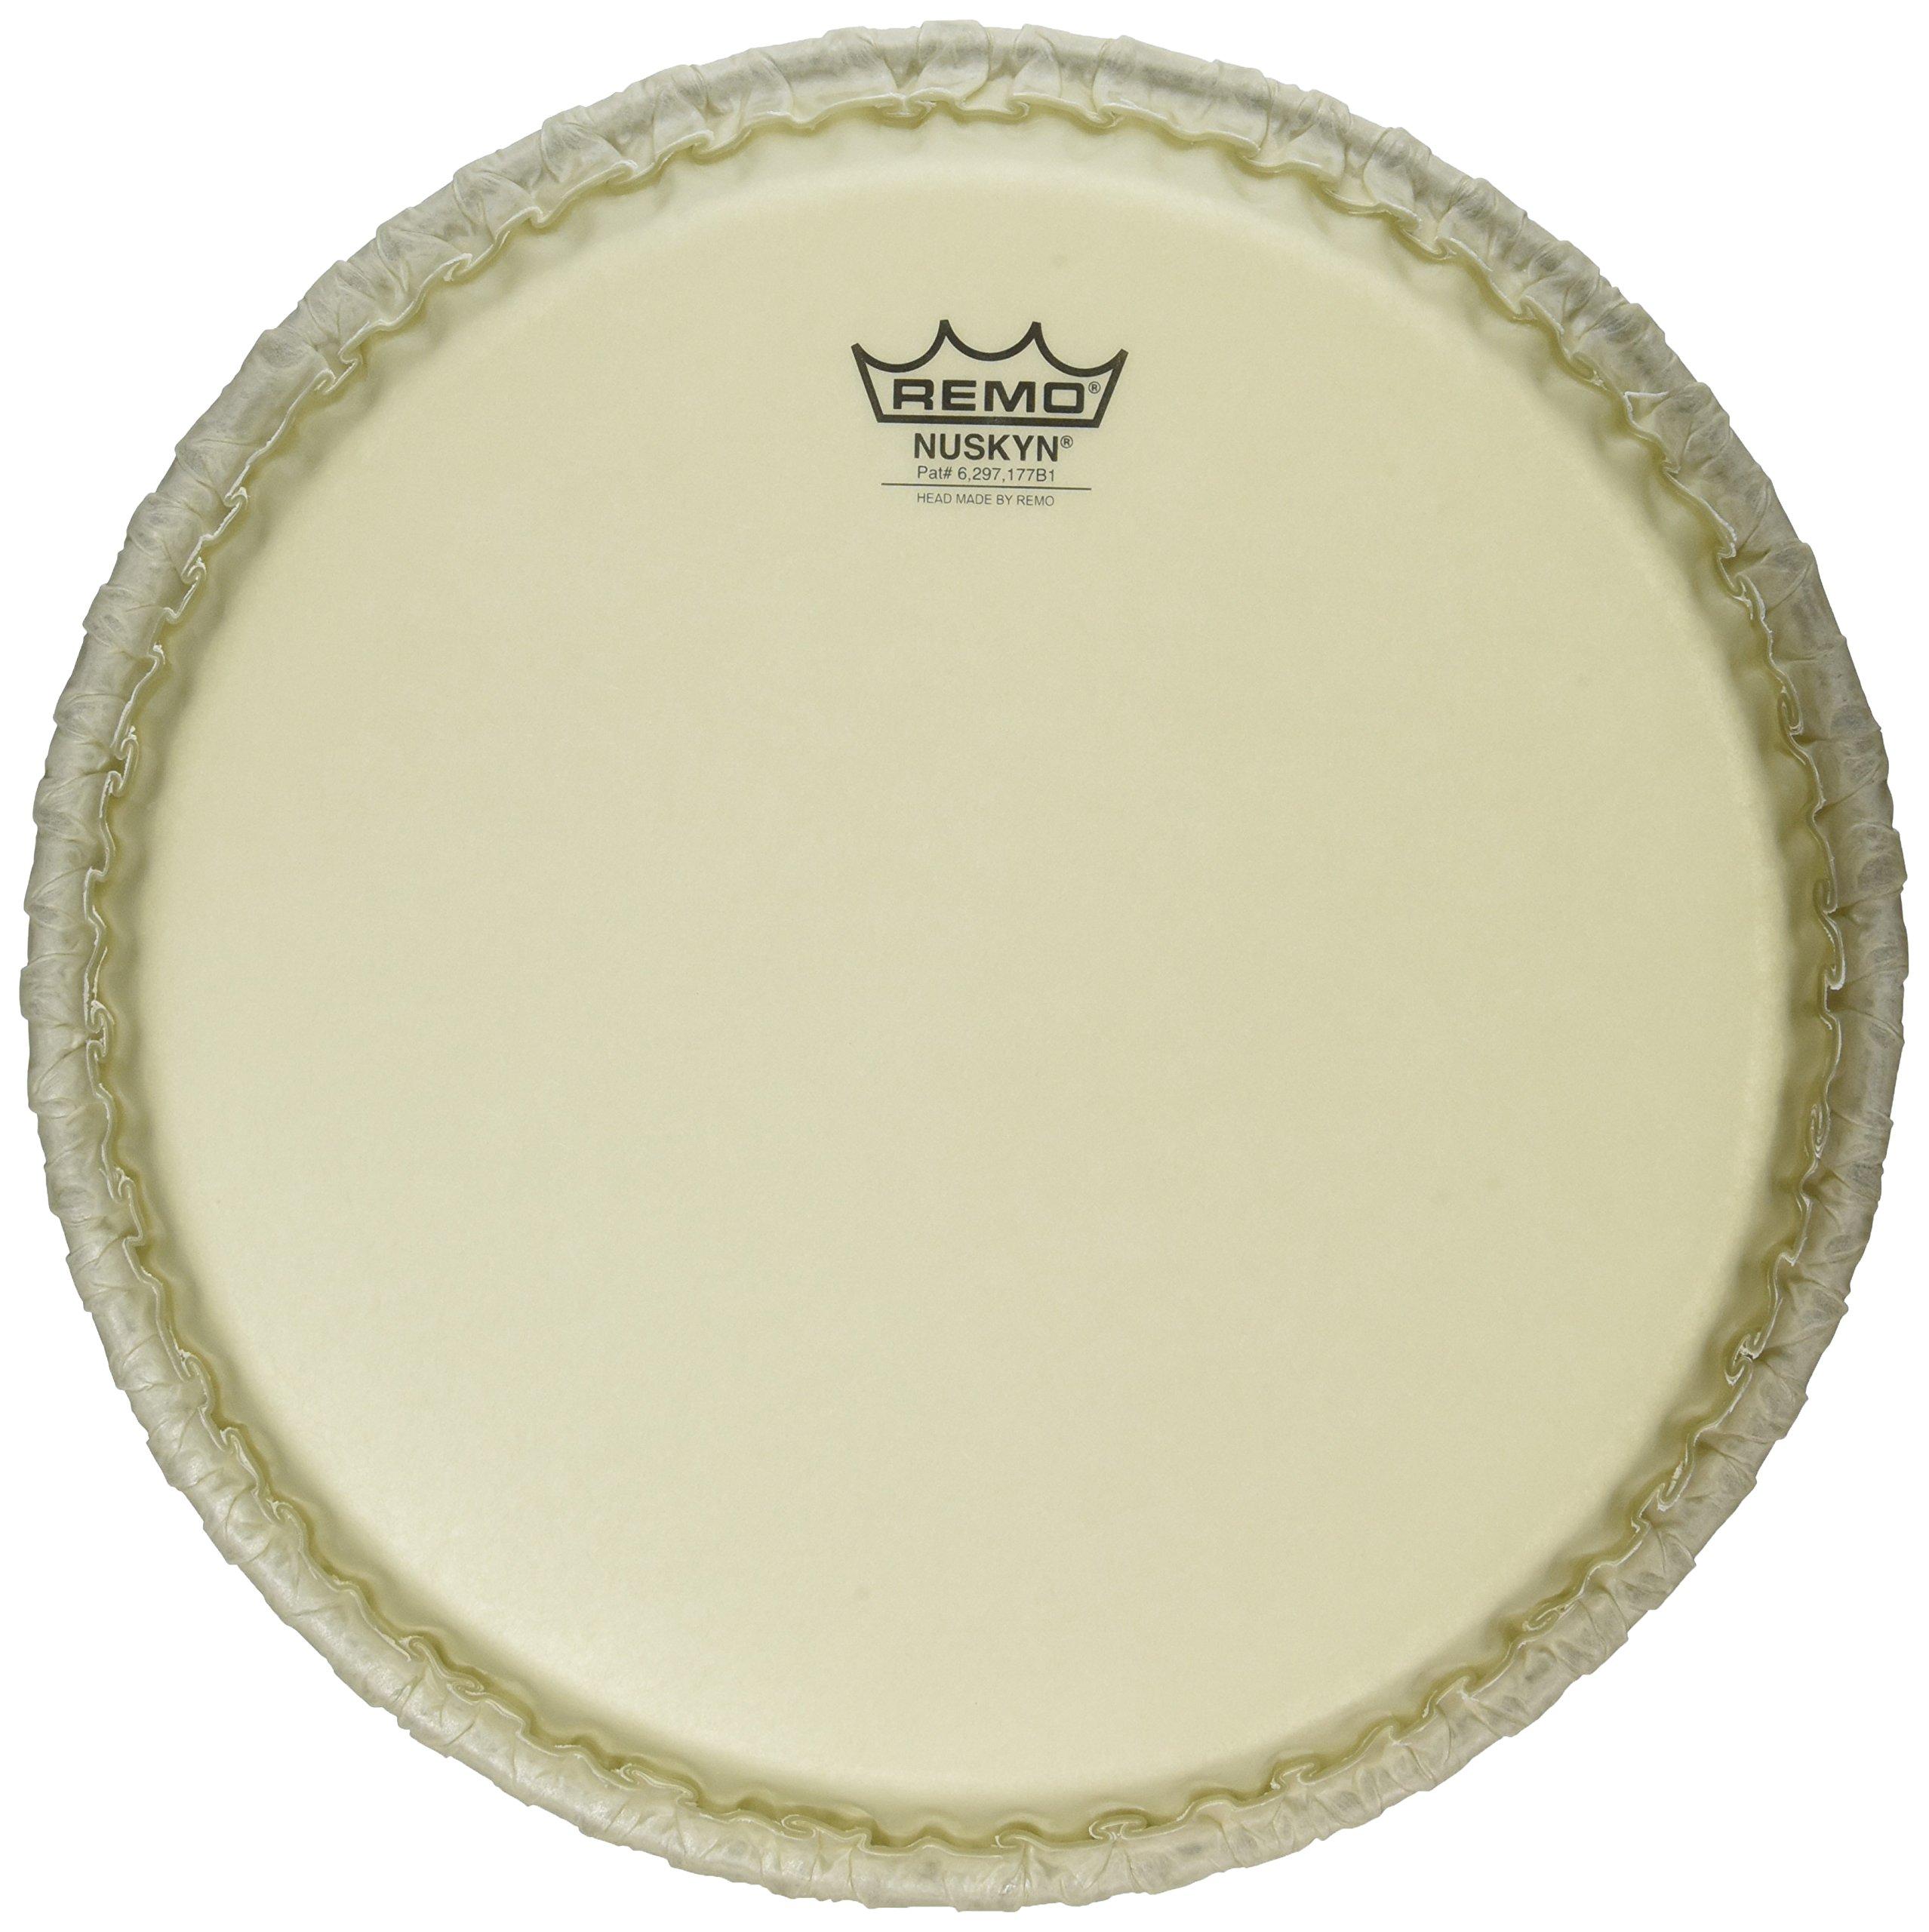 Remo Tucked Nuskyn Conga Drumhead, 11.75''